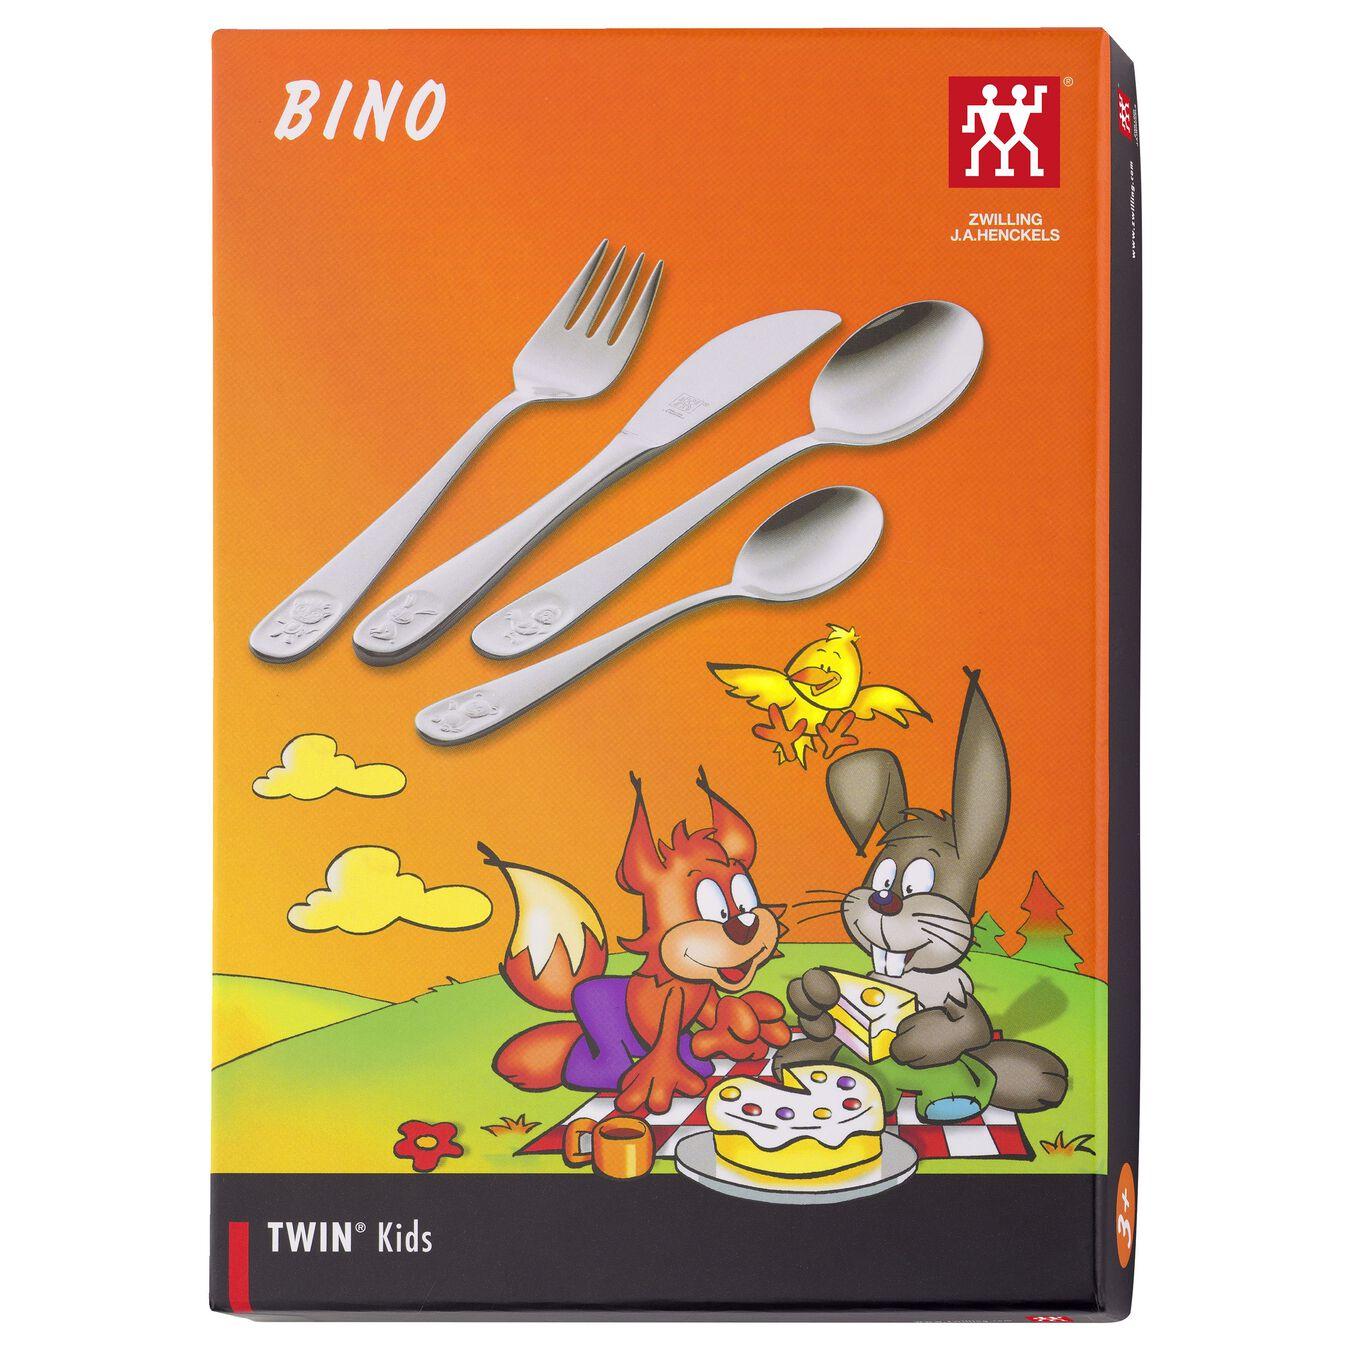 4-pc TWIN Kids  Bino Flatware Set, 18/10 Stainless Steel ,,large 2